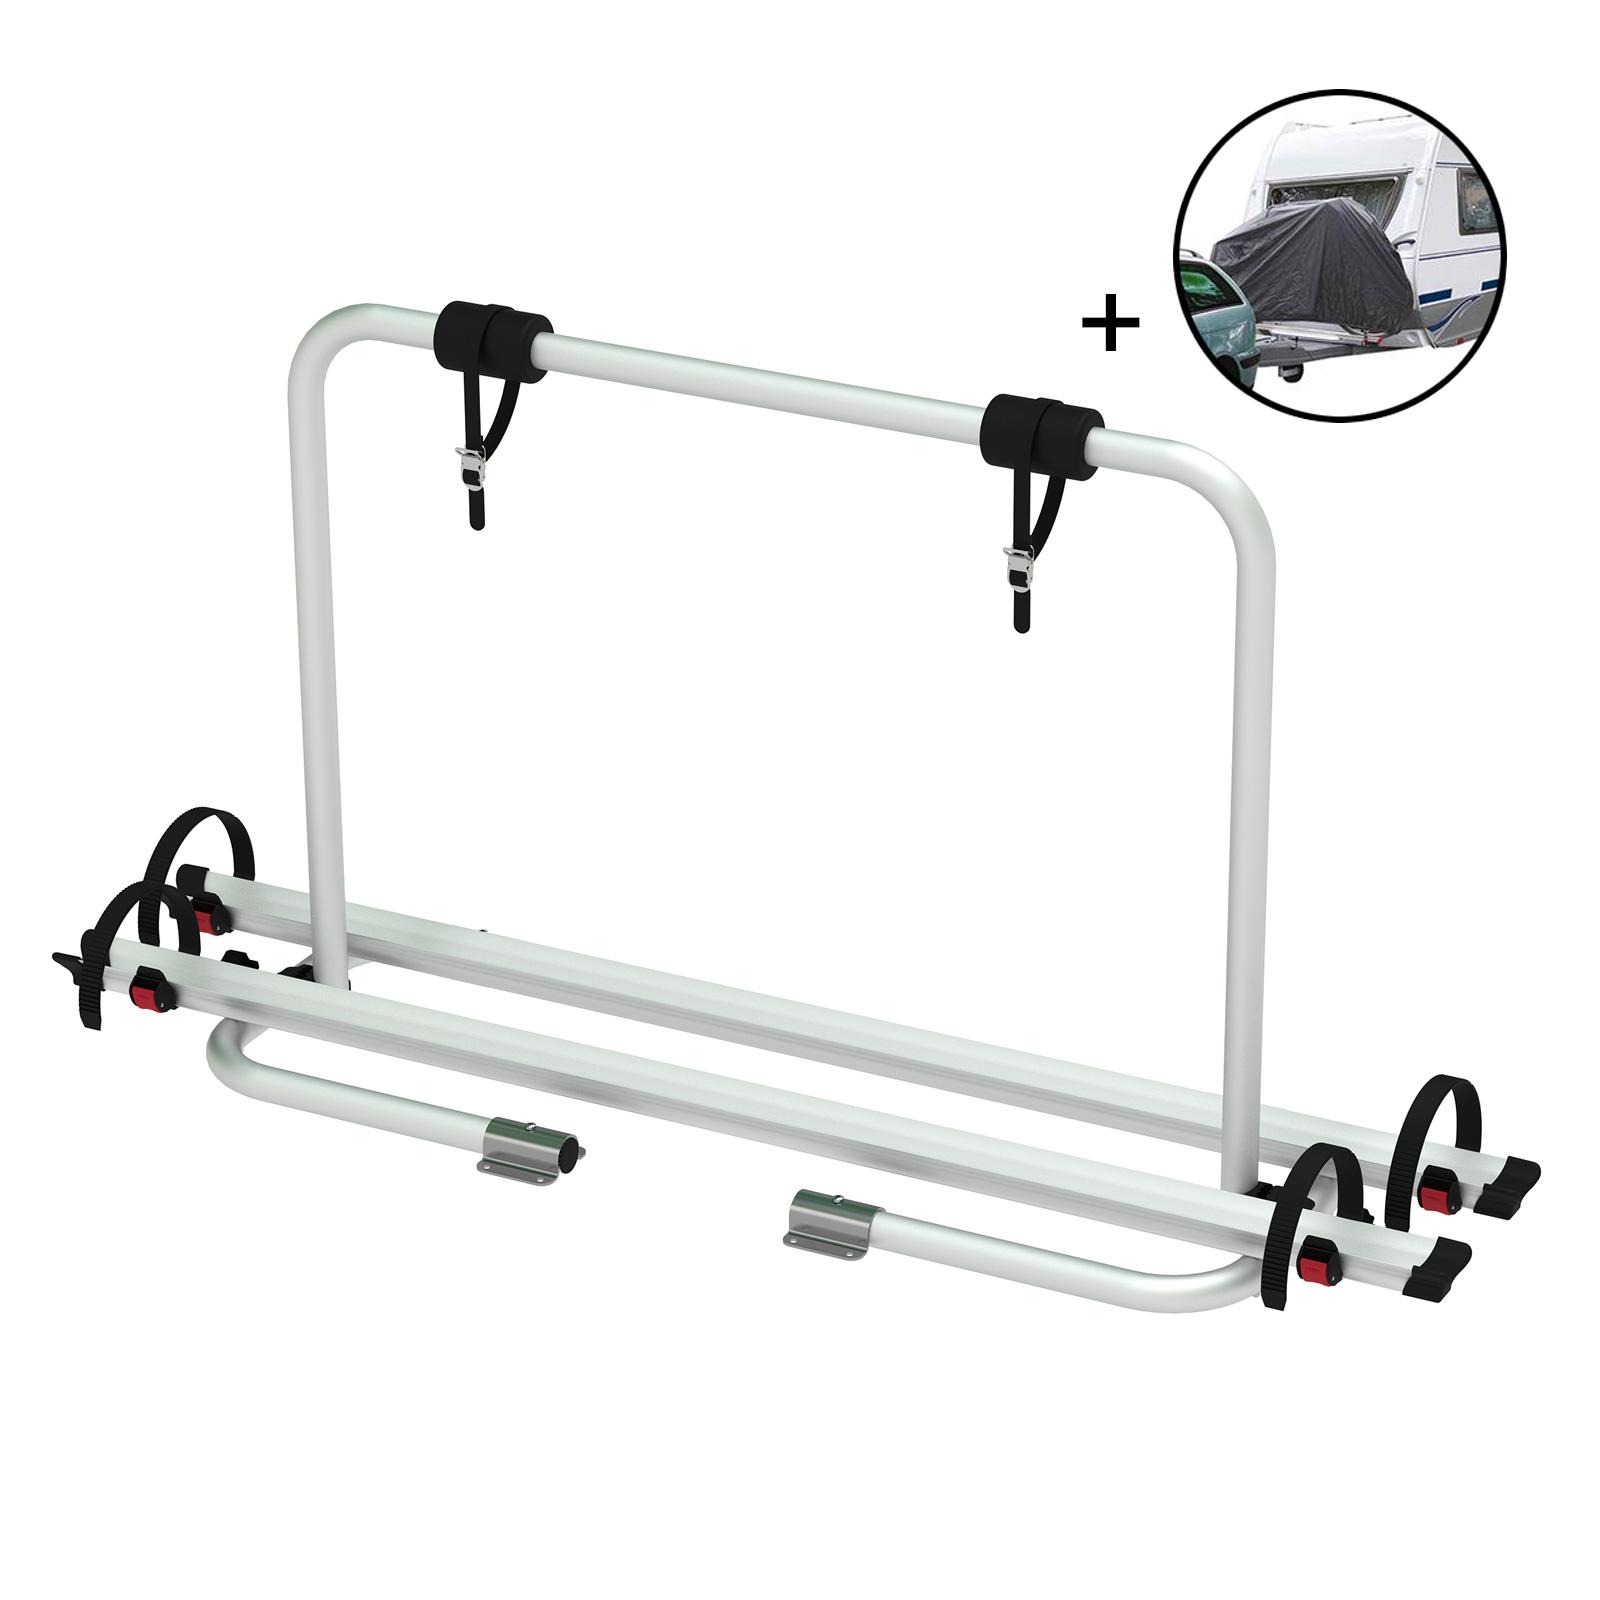 Deichsel Fahrradträger Caravan ECO | 2 Fahrräder | 50 Kg belastbar